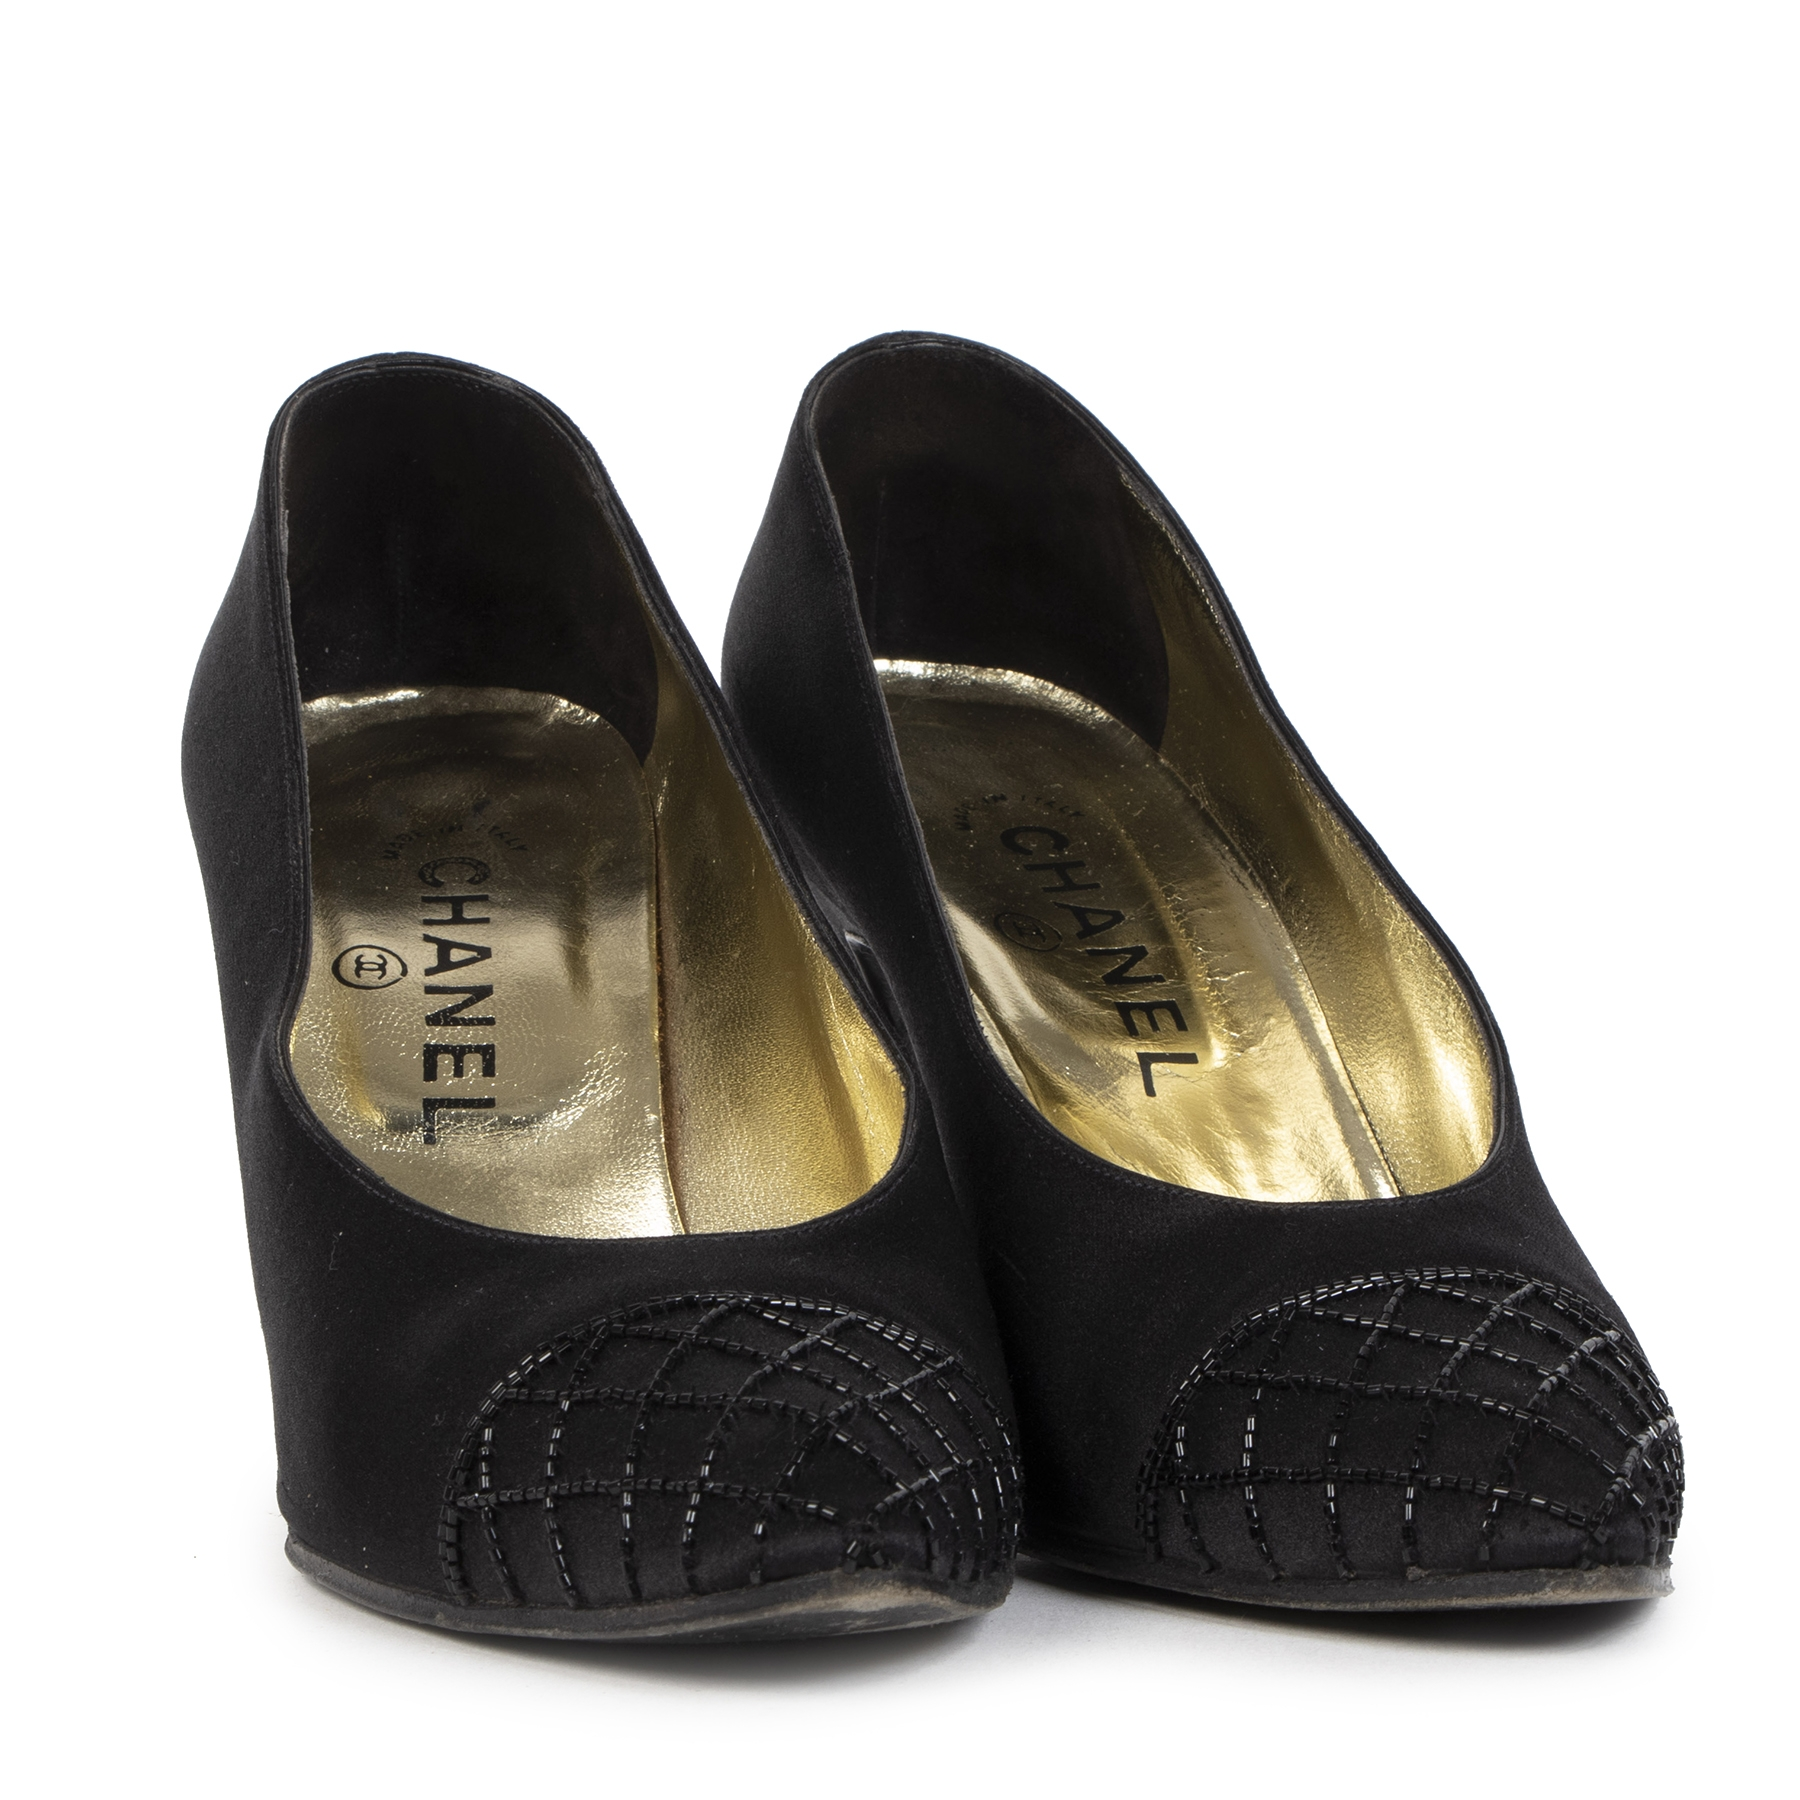 Authentic secondhand Chanel Black Beaded Satin Pointy Pumps - size 37,5 designer shoes high heels designer brands fashion luxury vintage webshop worldwide shipping safe secure online shopping Antwerp Belgium